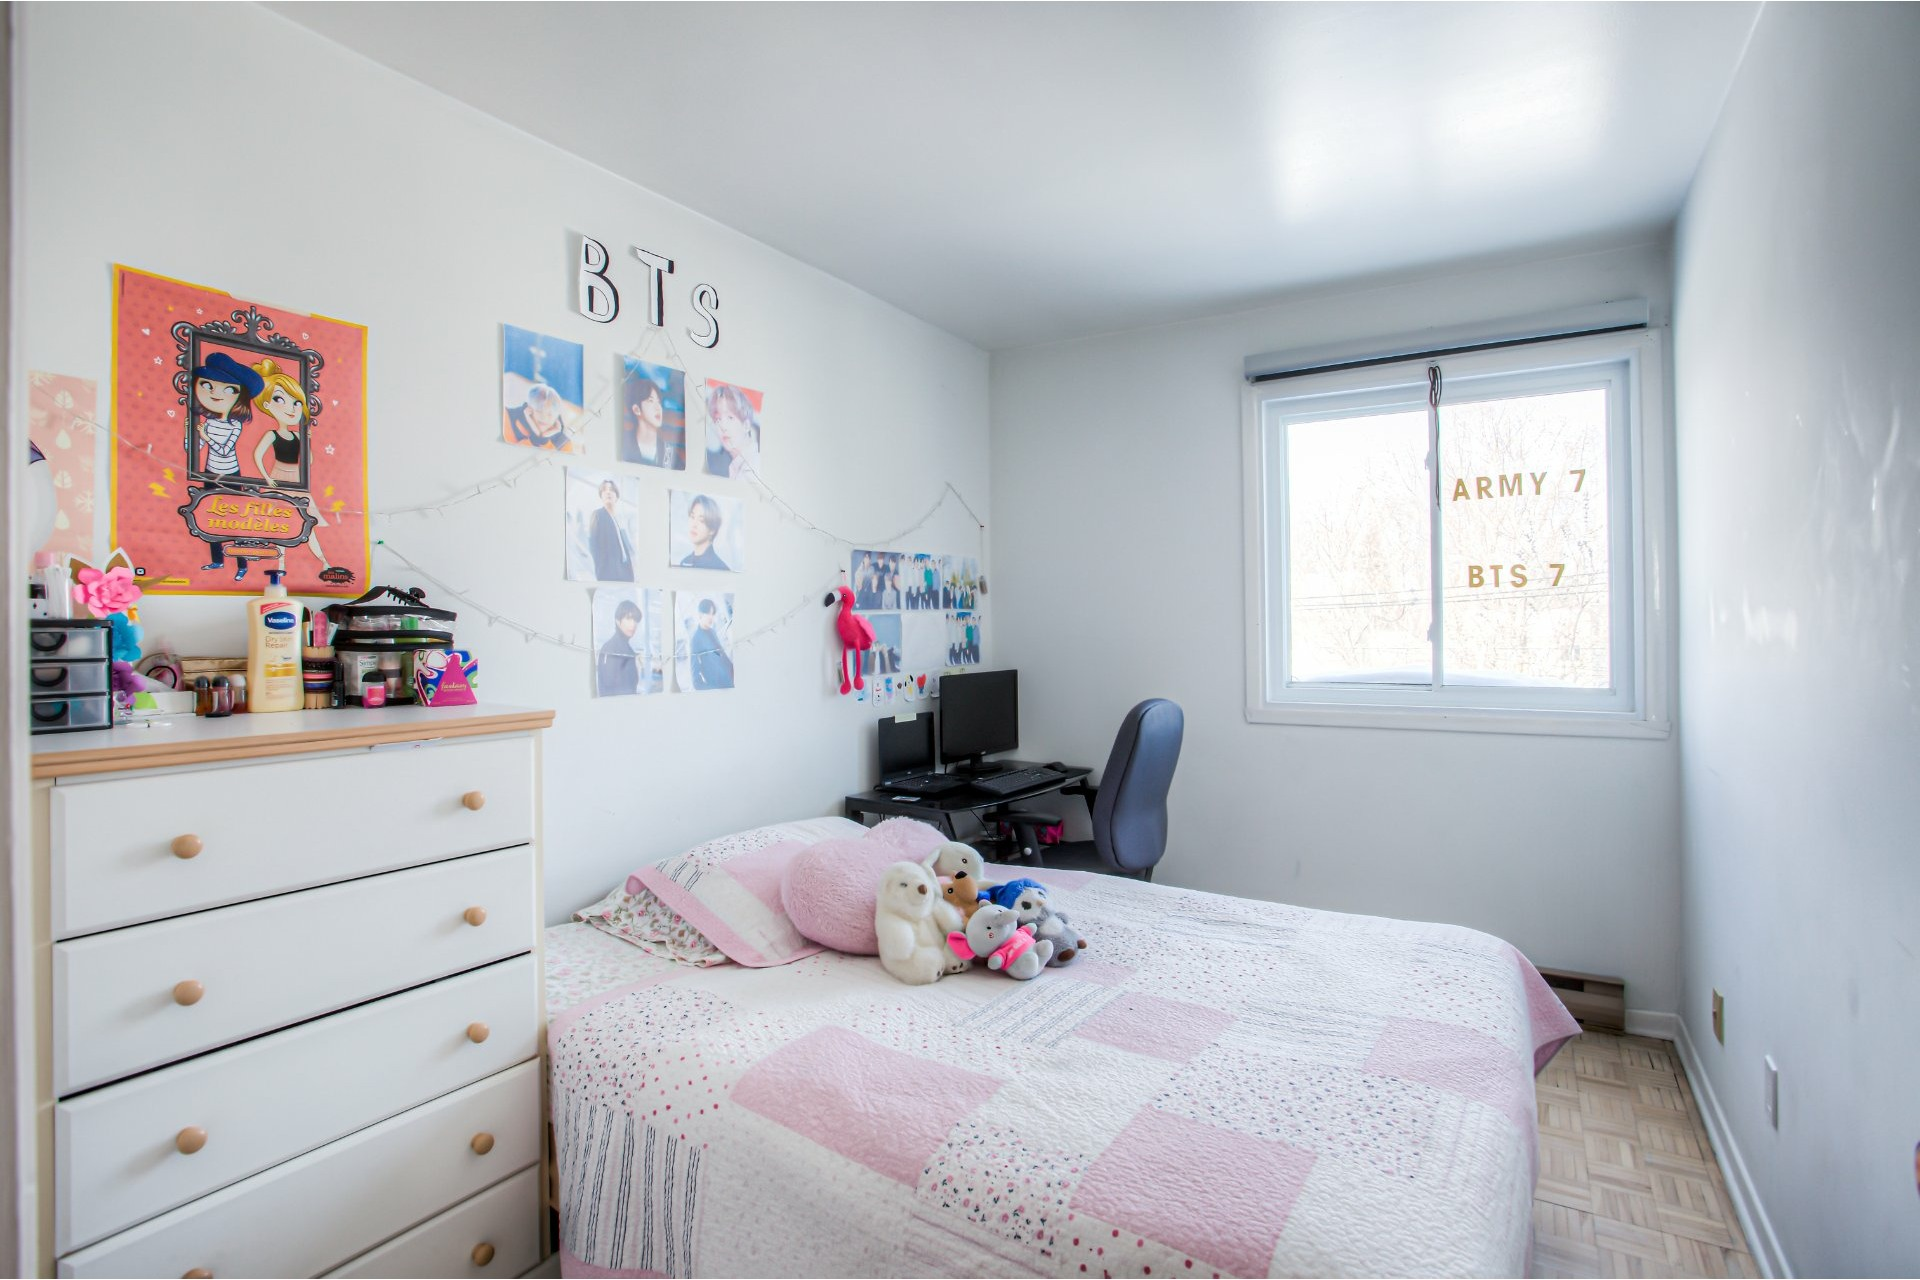 image 18 - House For rent Pierrefonds-Roxboro Montréal  - 9 rooms